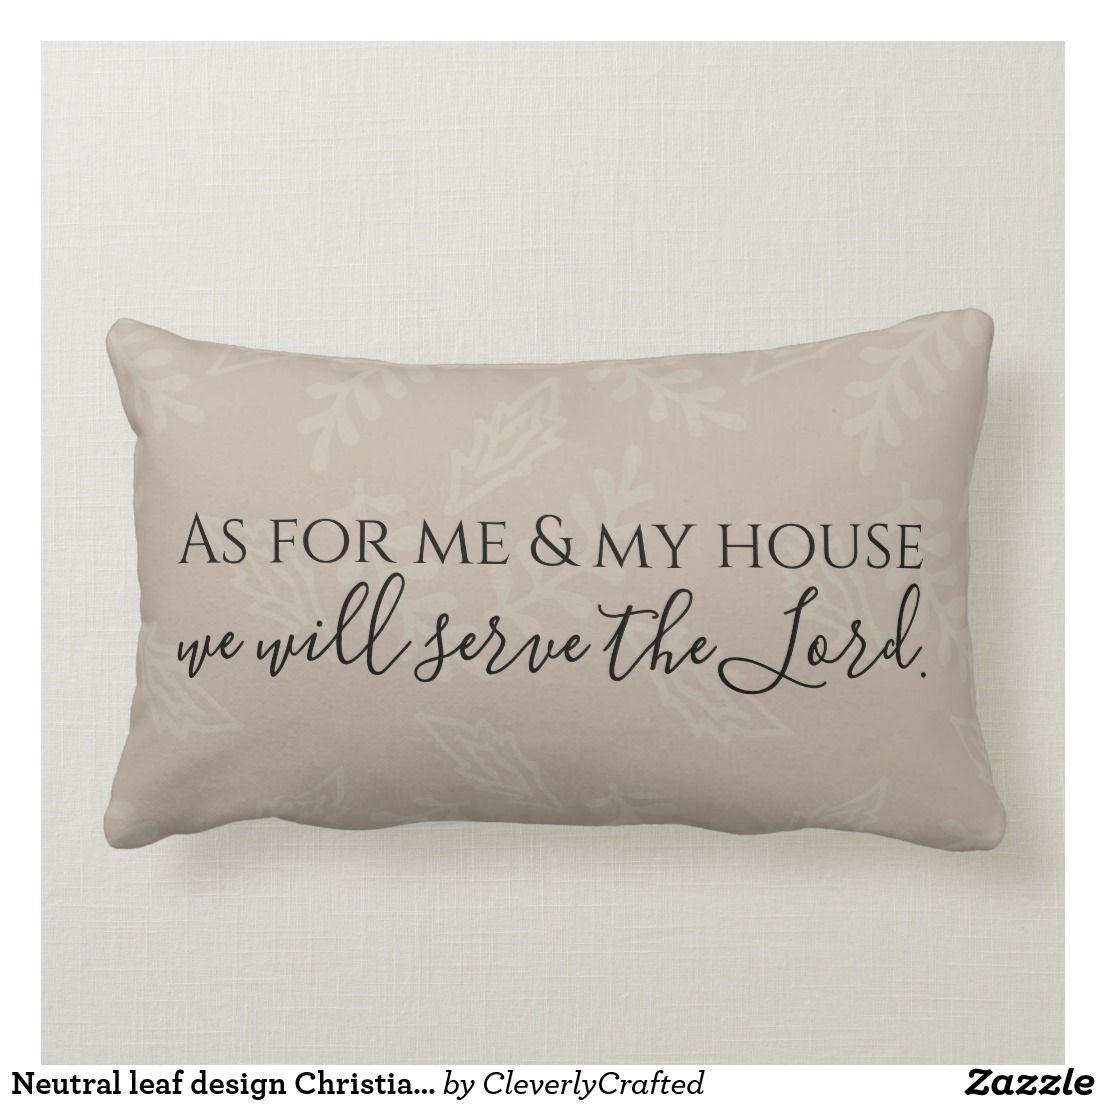 Neutral leaf design Christian pillow